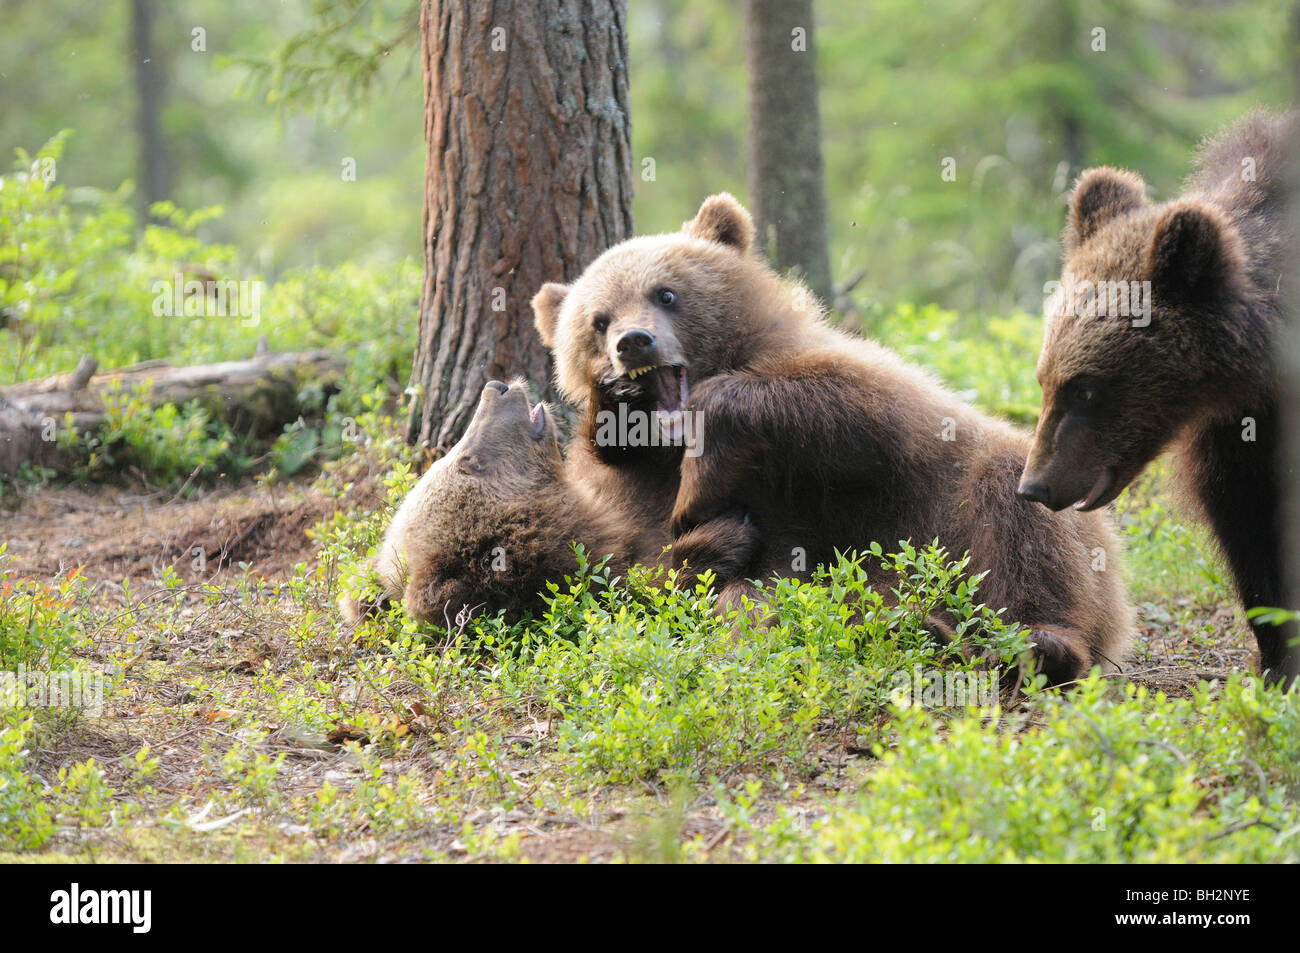 Europäischer Braunbär Ursos Arctos Cubs spielen fotografiert in Finnland Stockfoto